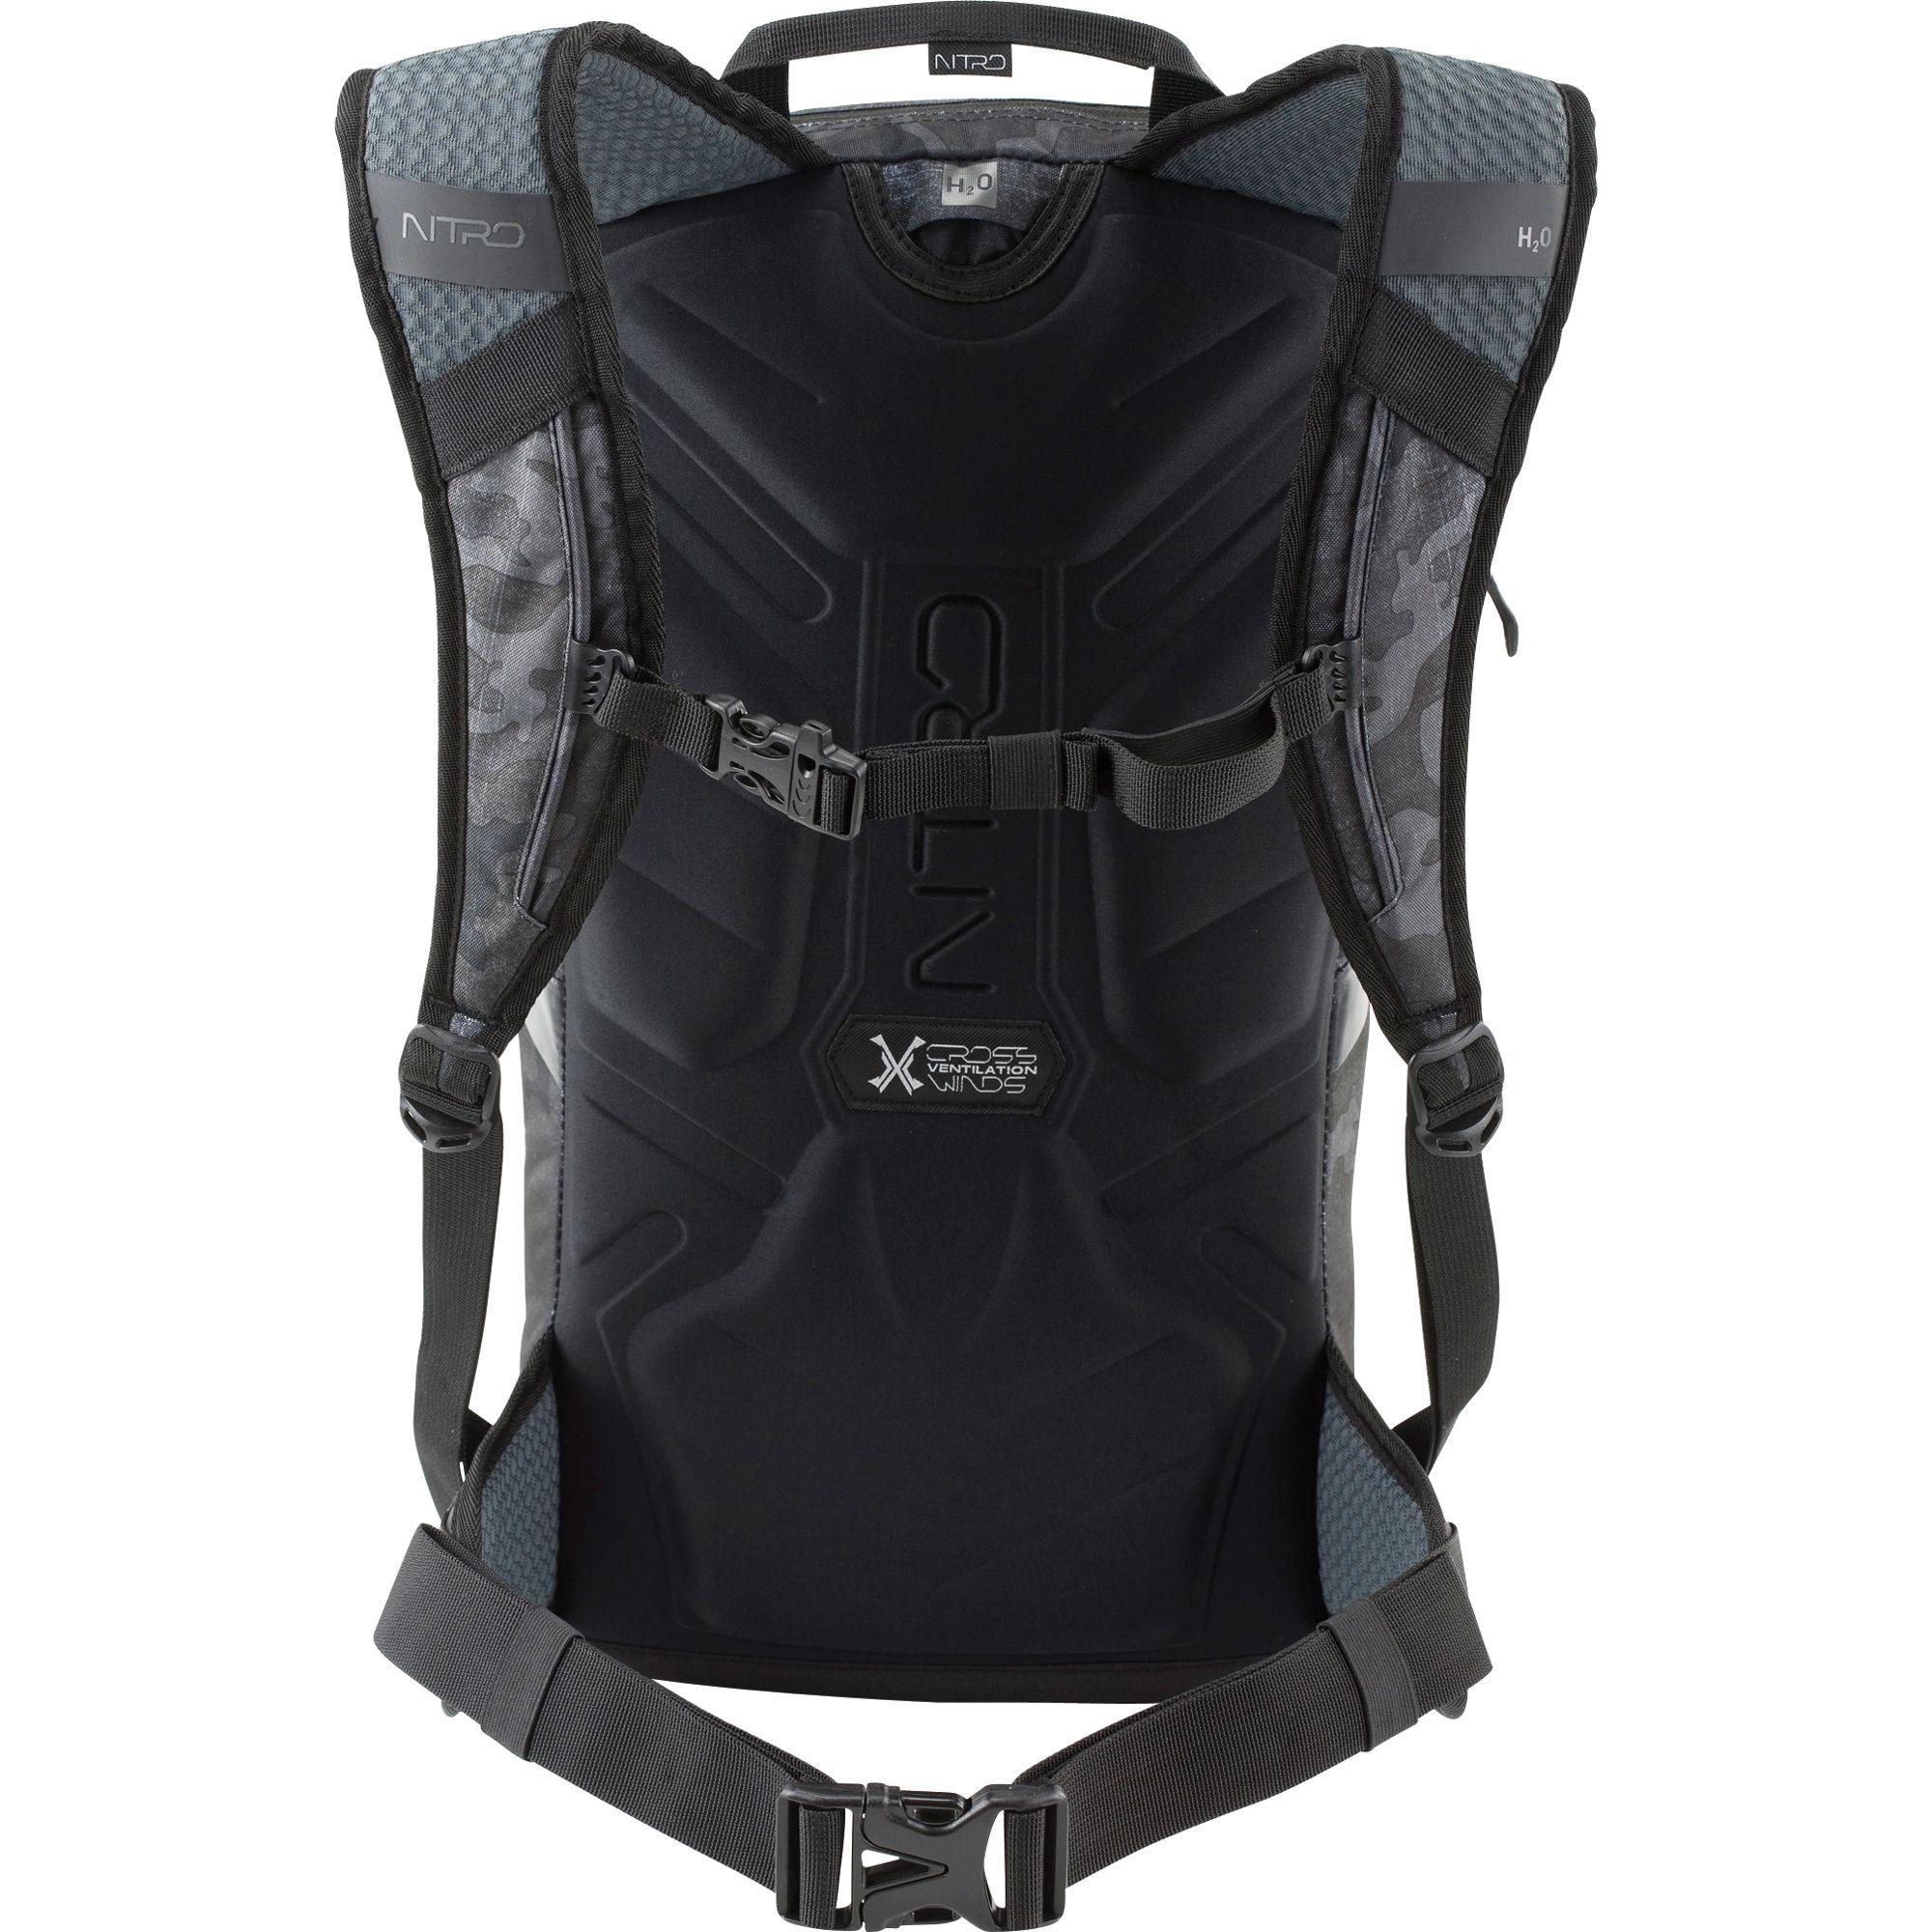 Bagpacks -  nitro Rover 14